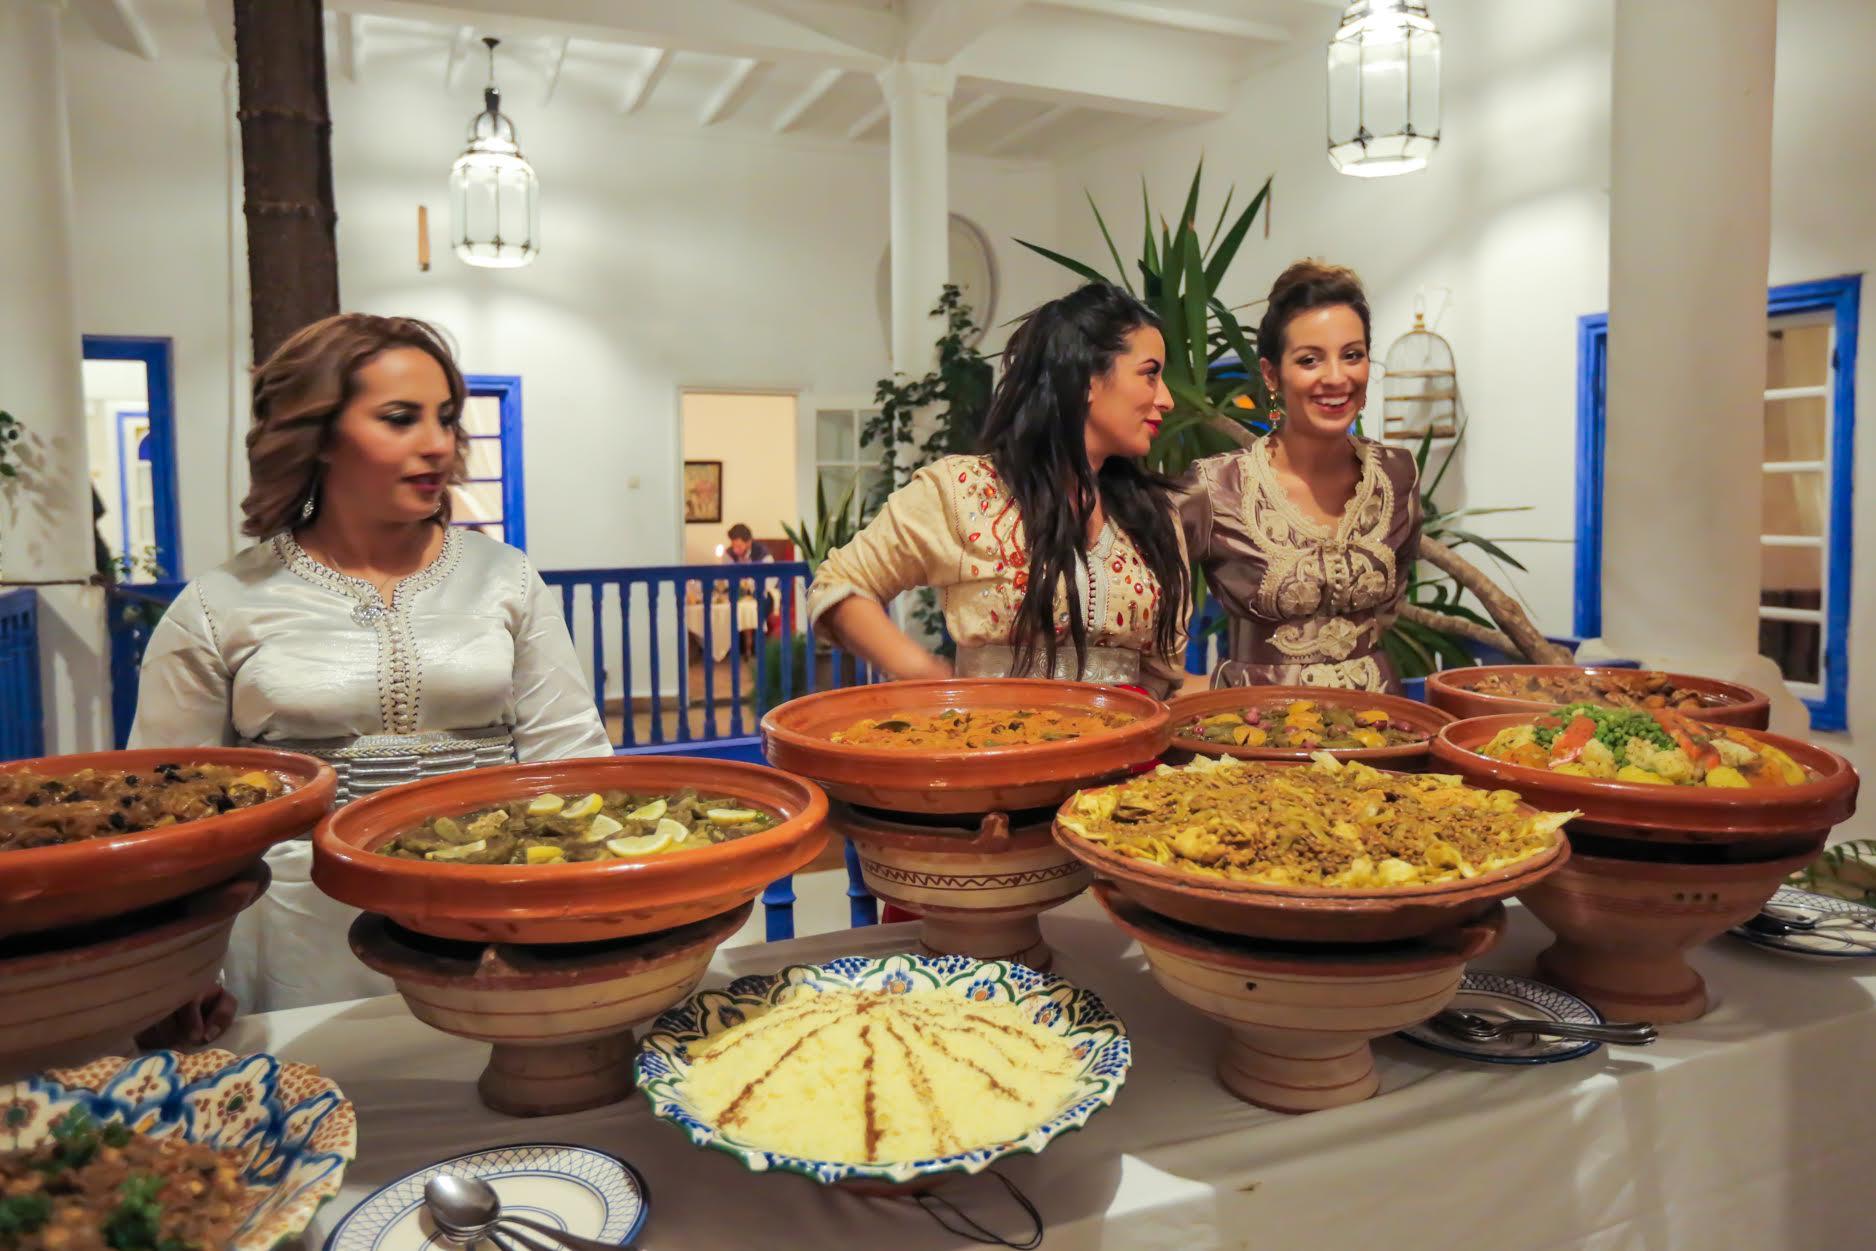 Les f tes de fin d 39 ann e villa maroc essaouira - Les jardins de villa maroc essaouira ...